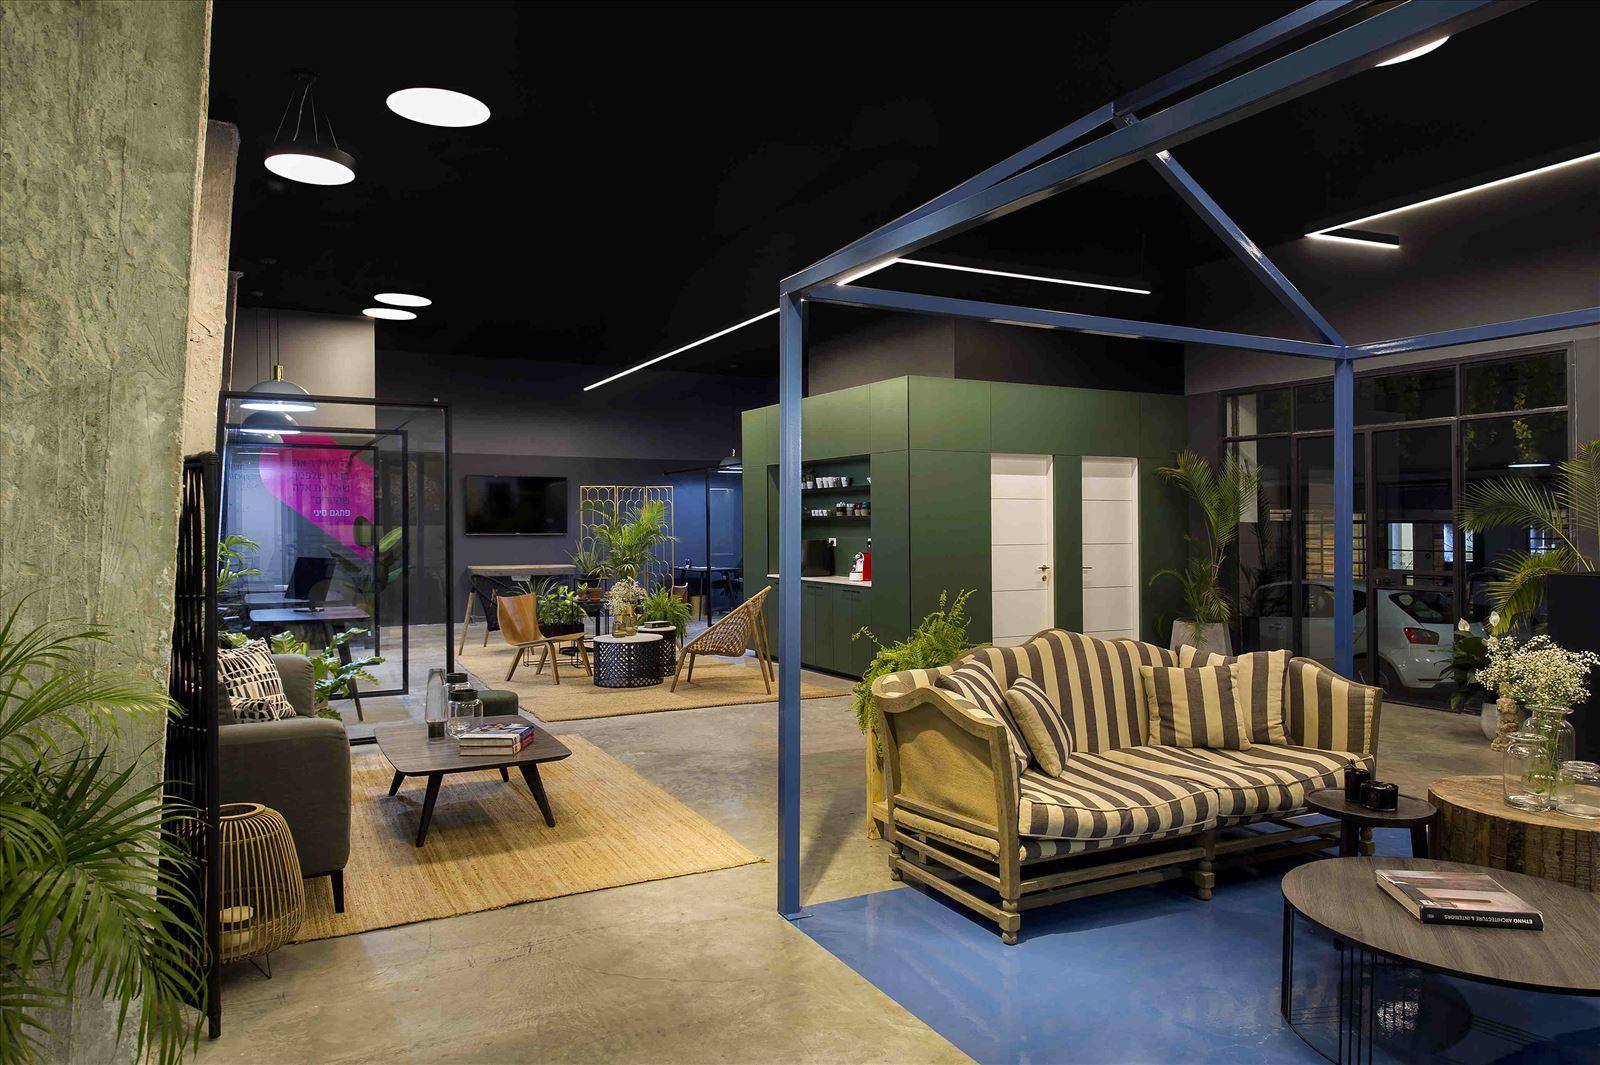 Ewave Offices תאורה מדהימה במשרדים נעשתה על ידי דורי קמחי